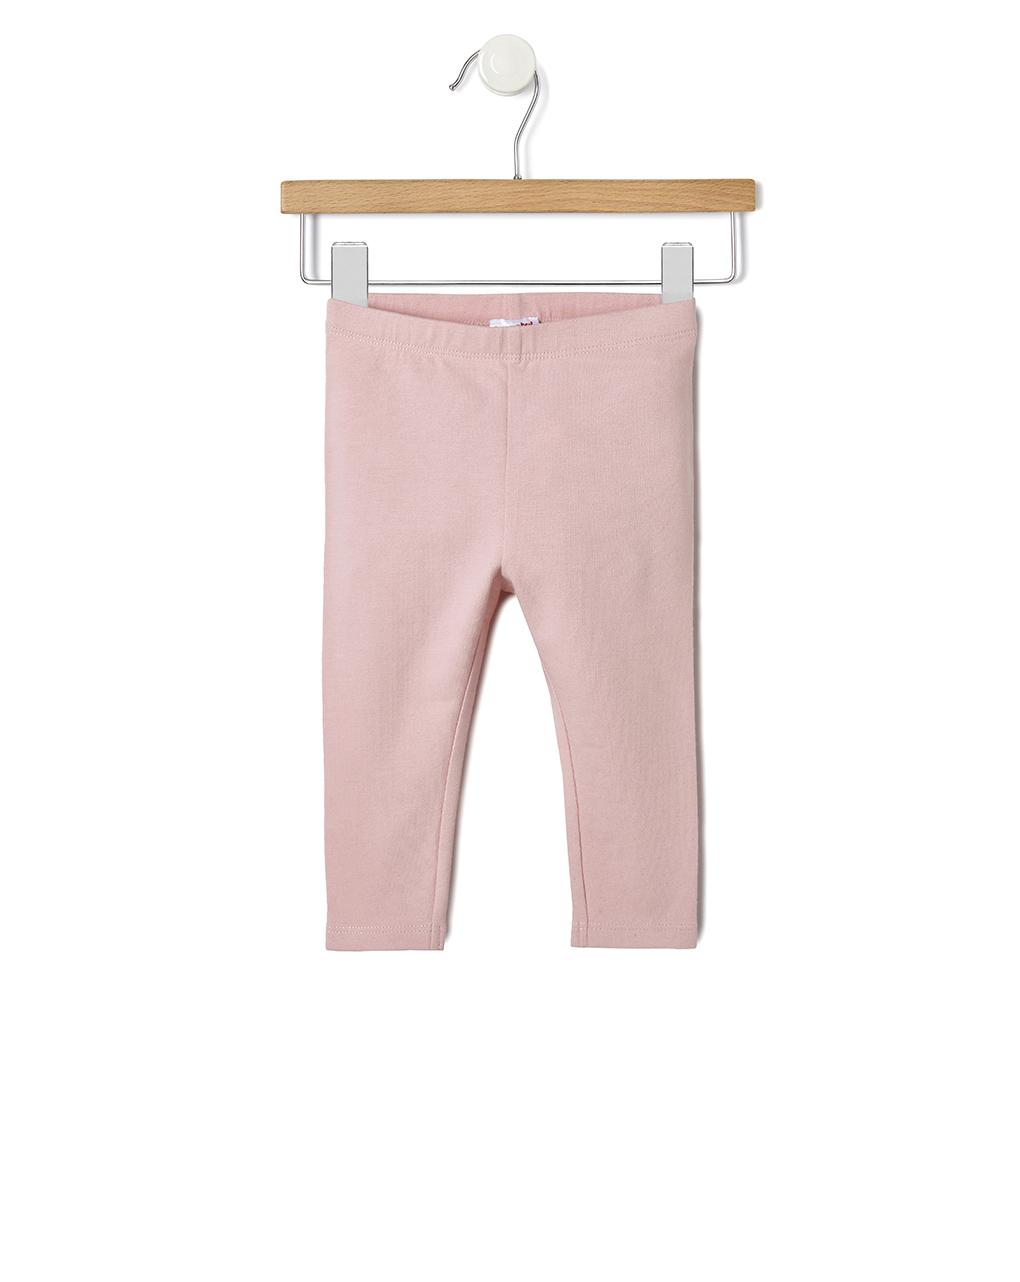 Leggings basici in cotone rosa chiaro - Prénatal